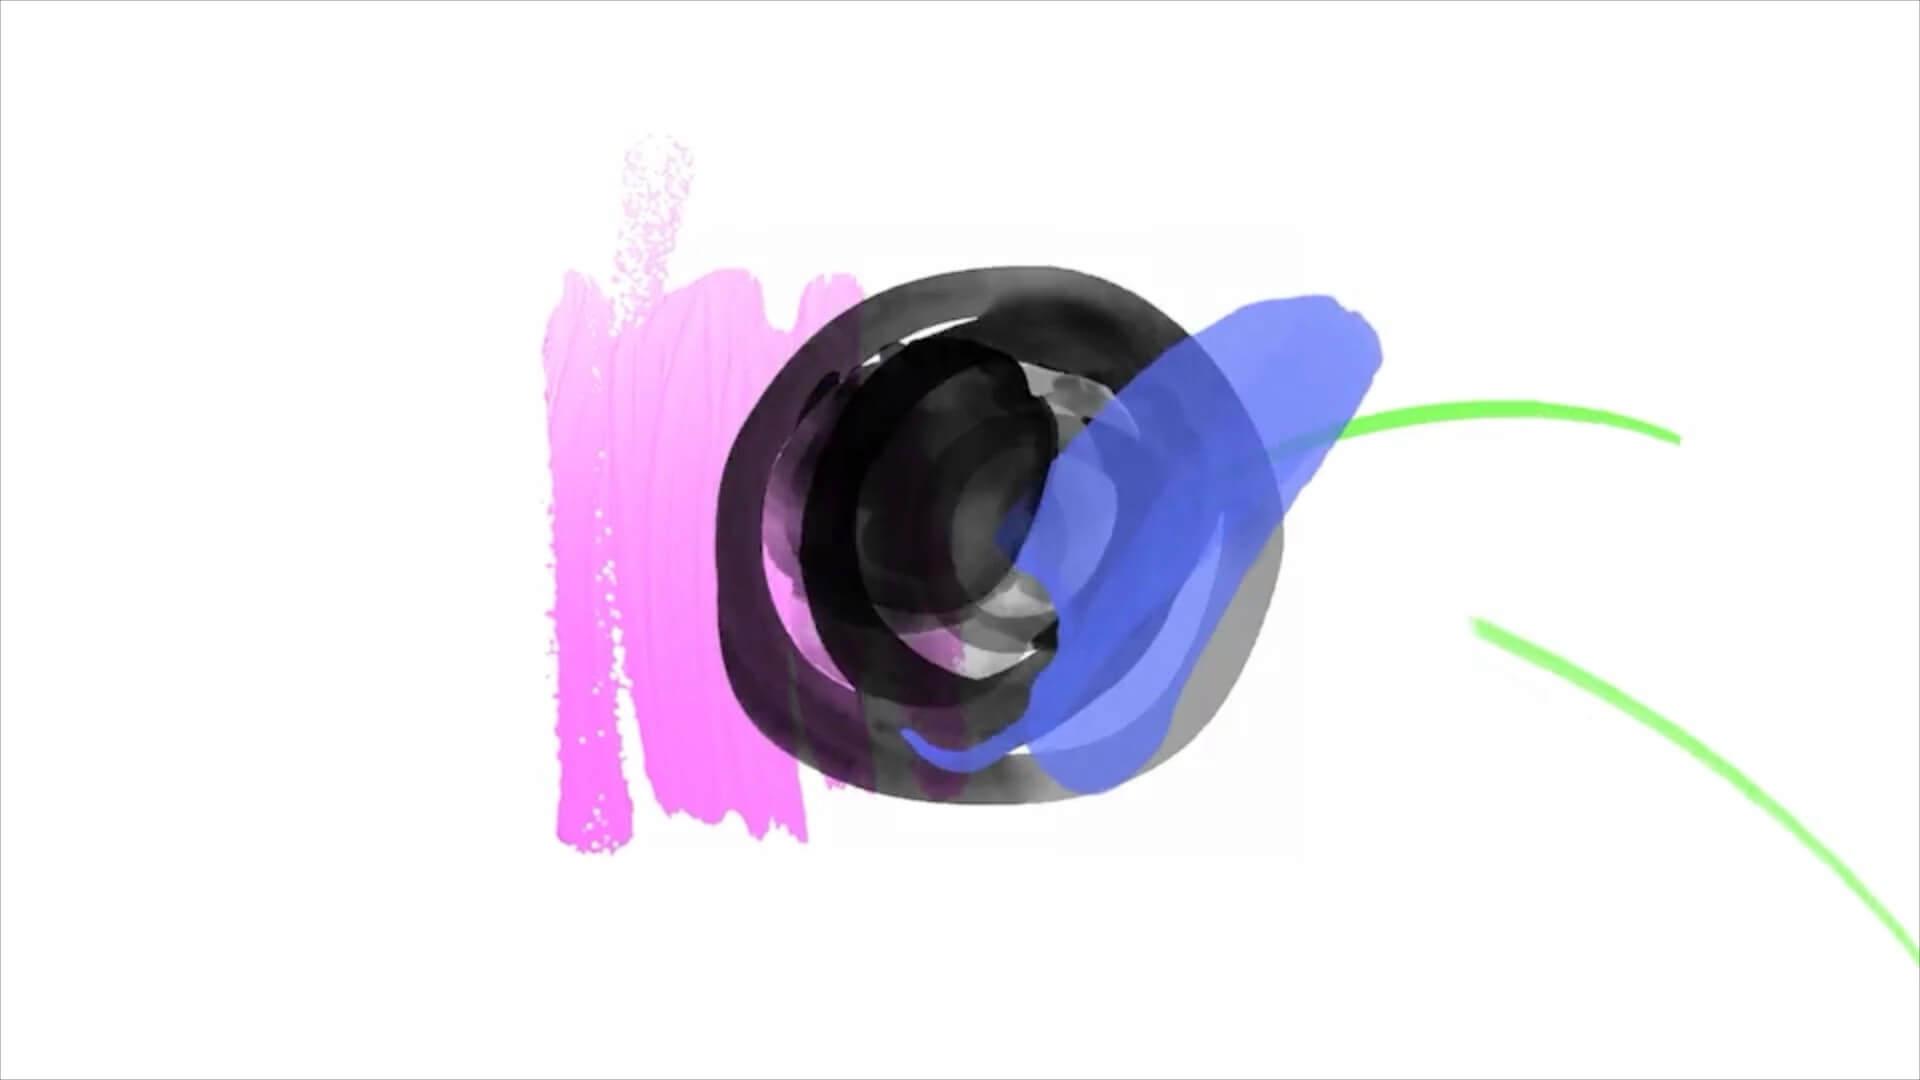 fcpx插件 彩色水墨笔刷效果LOGO徽标展示动画模板 Hand Drawn Brush Logo